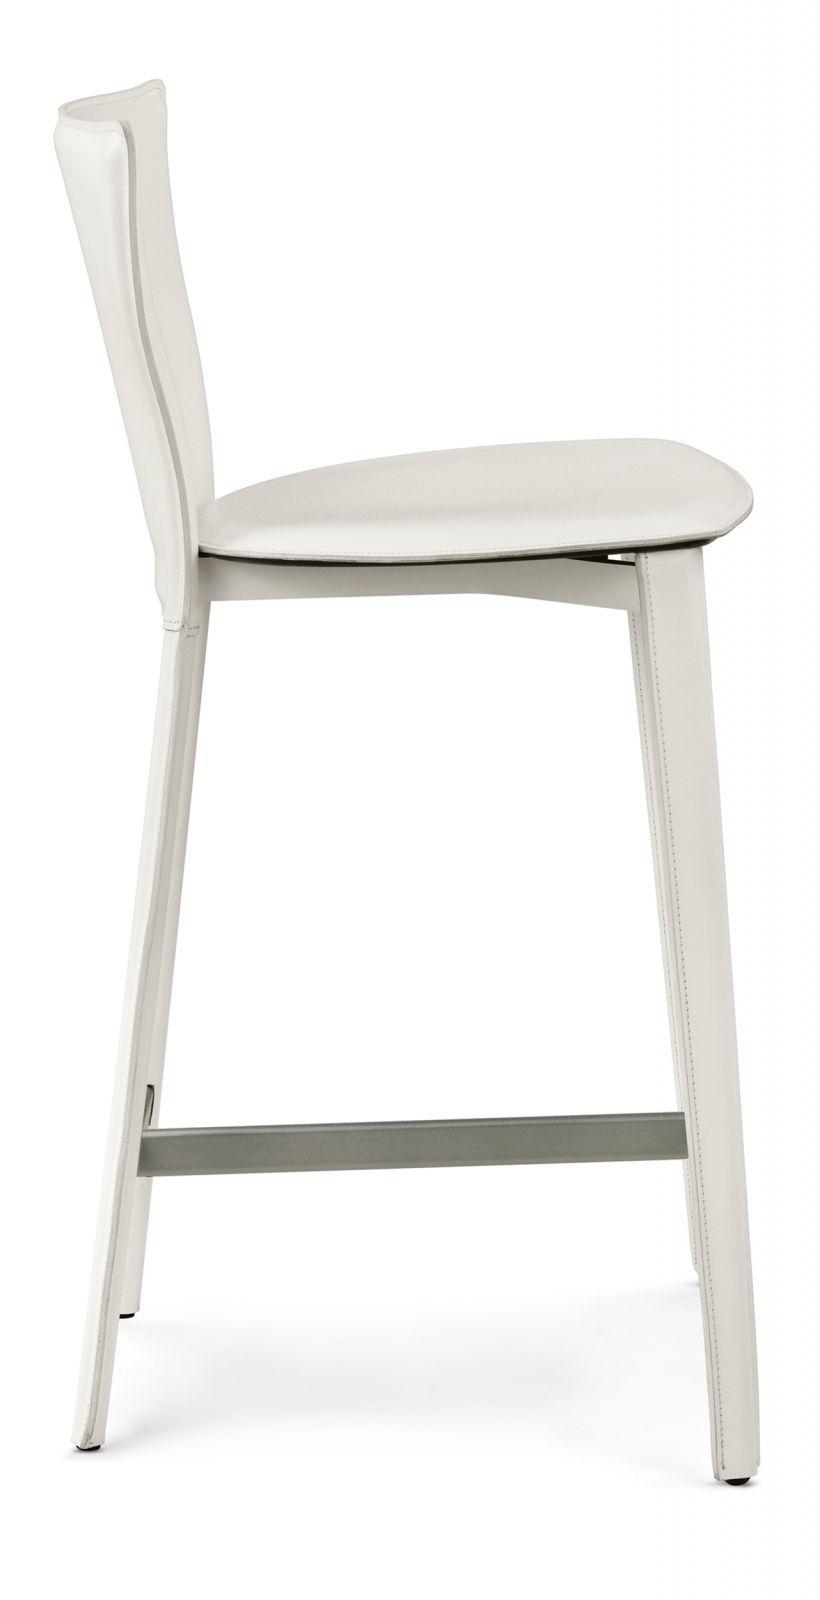 modern-bar-stools-Italian-furniture-large (47).jpg